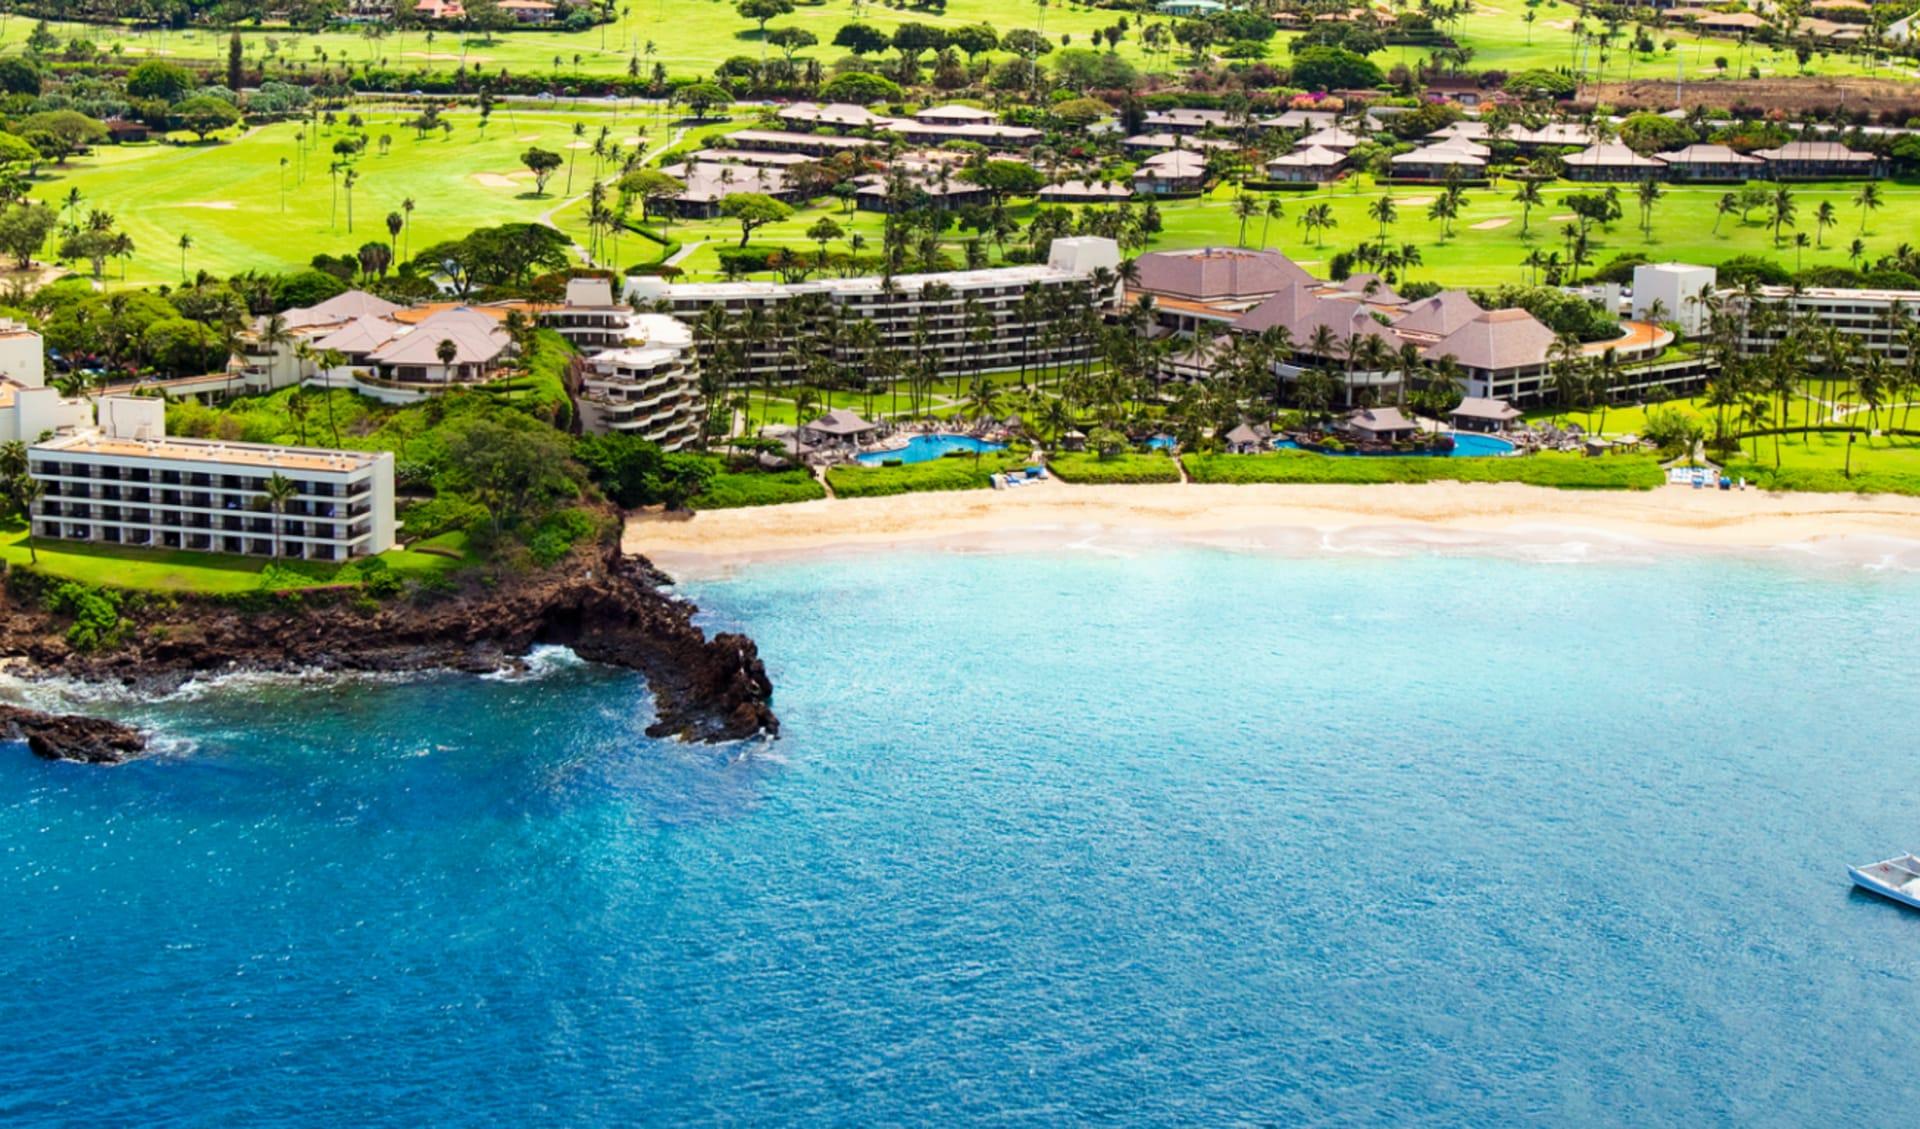 Sheraton Maui Resort in Lahaina - Maui: exterior sheraton maui hotelanlage meer strand